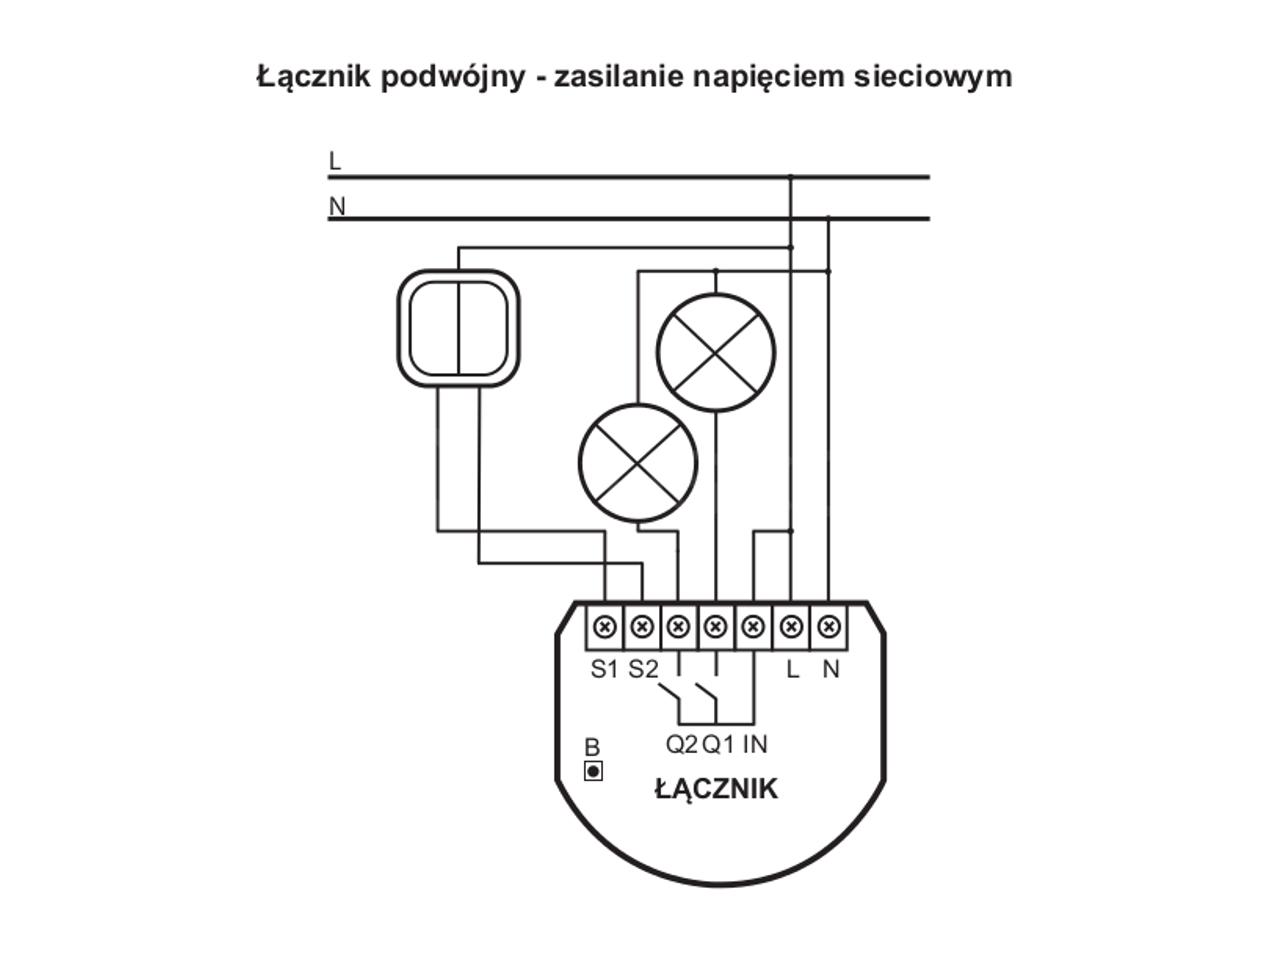 redarc bcdc1225 wiring diagram tail light 1996 chevy truck dc diagrams tank ship odicis